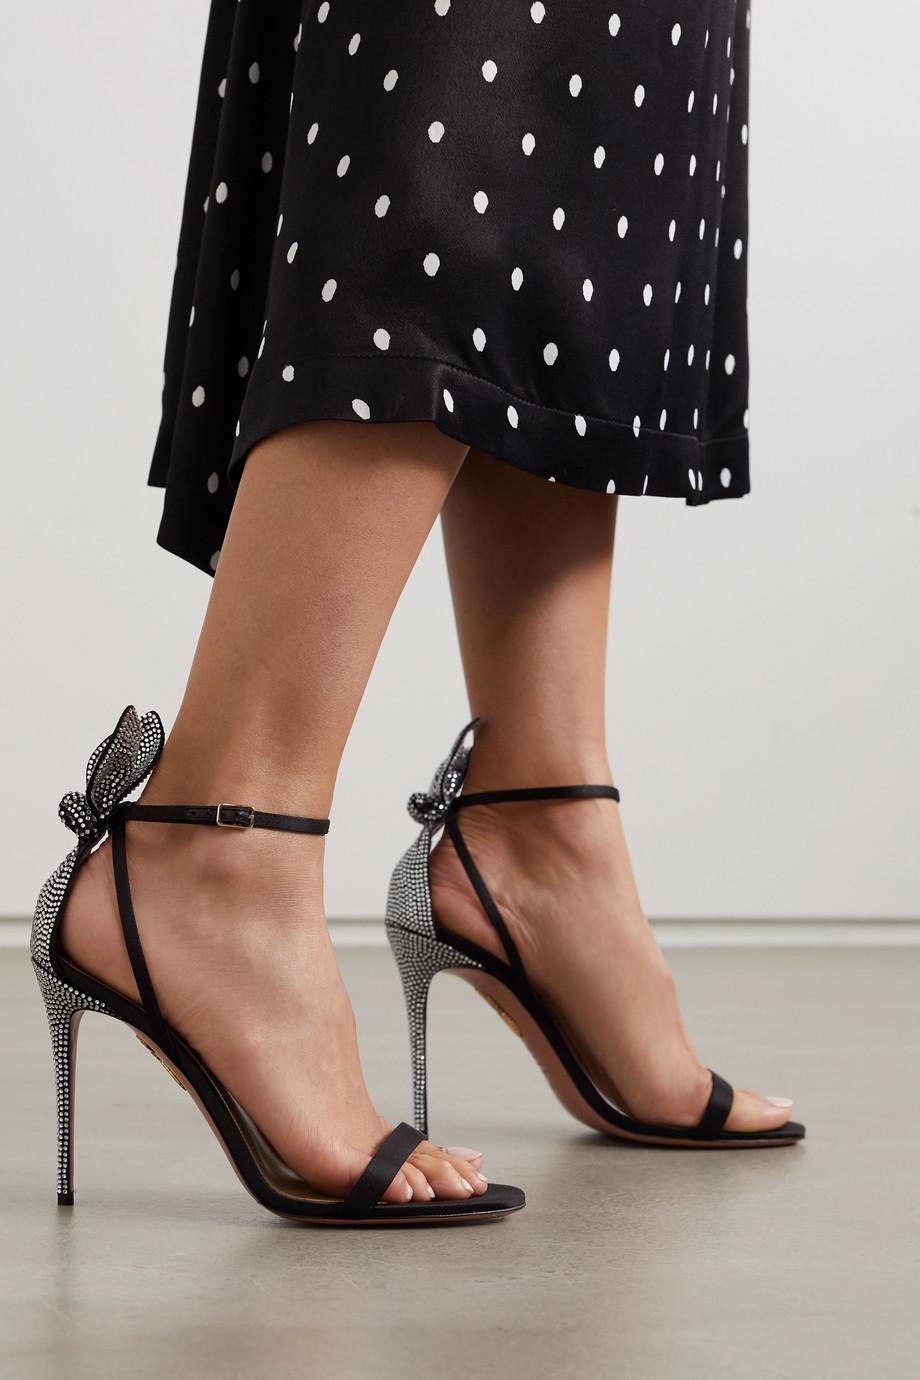 Aquazzura Bow Tie 105 crystal-embellished satin sandals